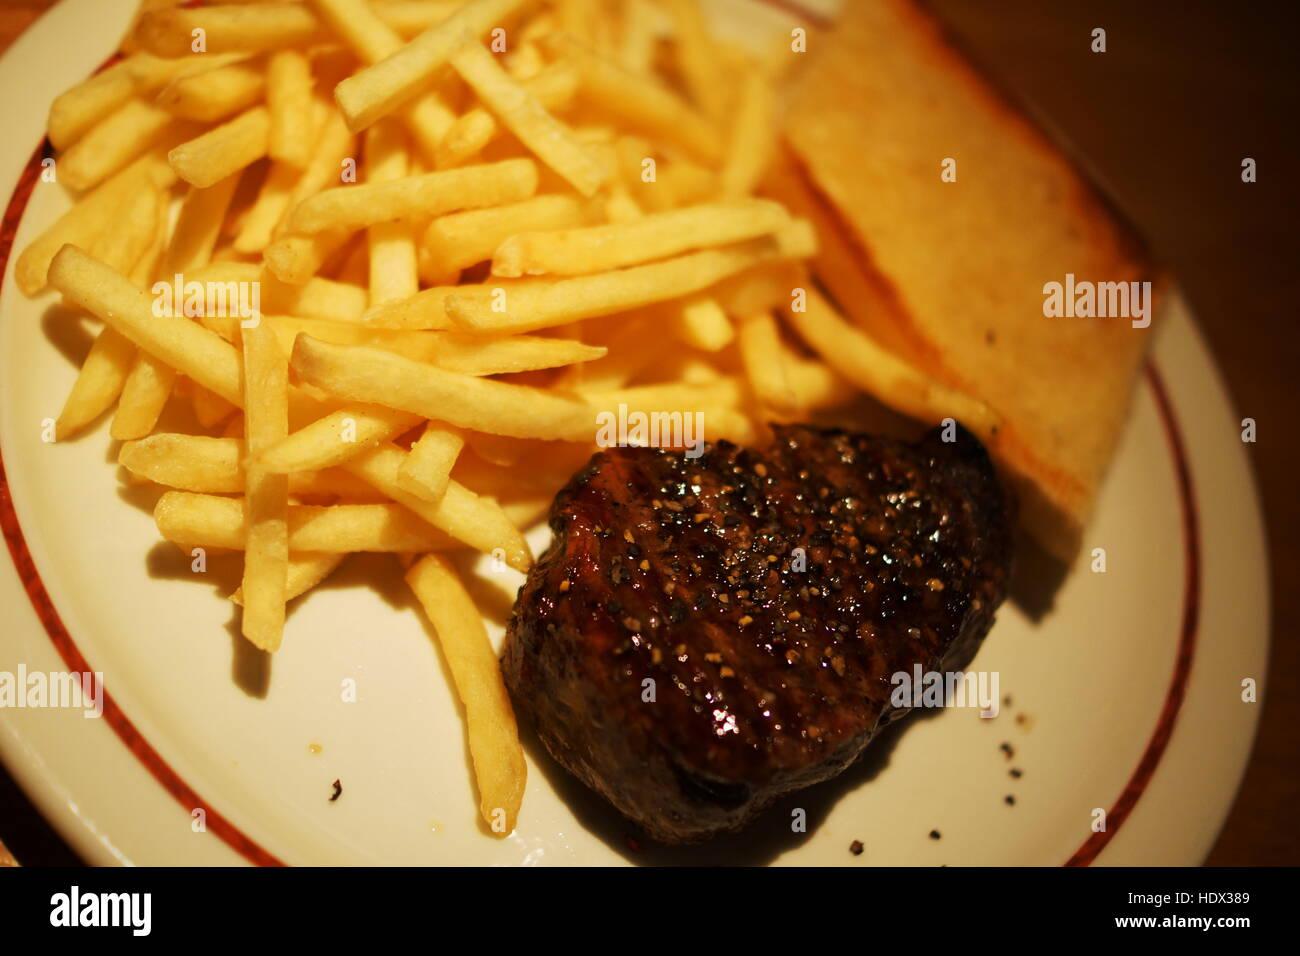 Leckeres Steak mit gebratenen Kartoffeln Stockbild